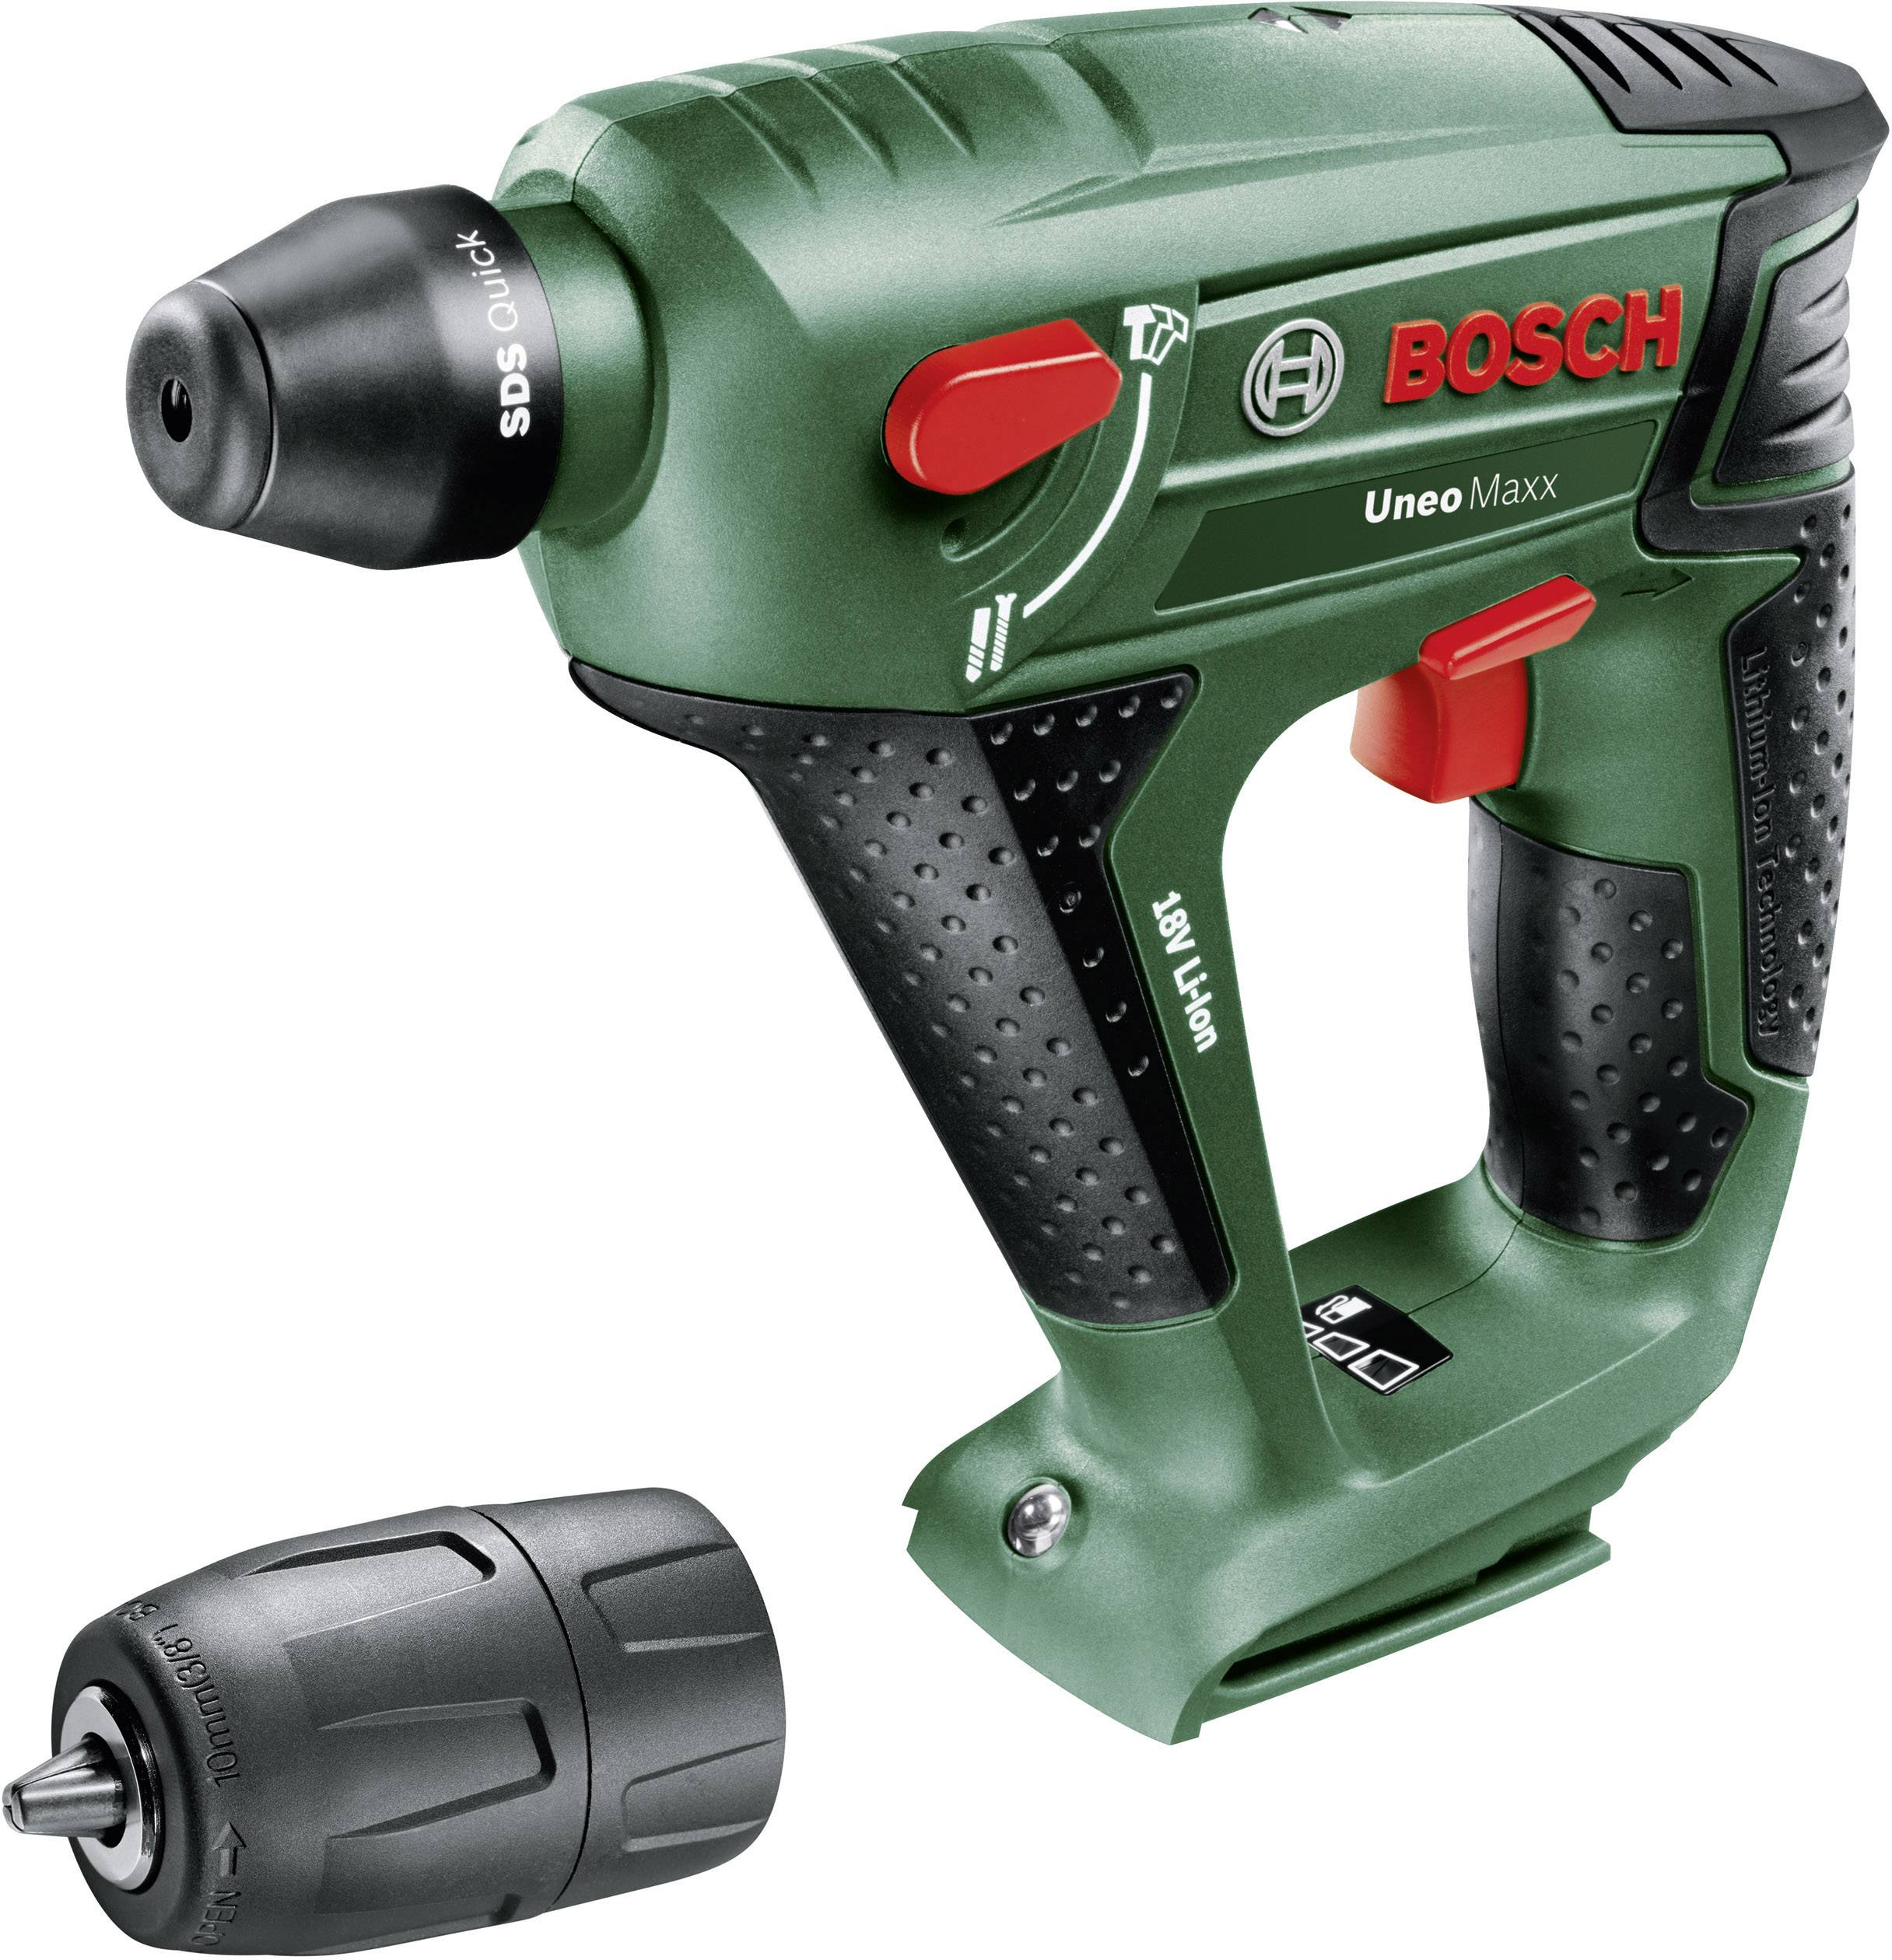 Bosch Home and Garden Uneo Maxx SDS Quick Akku Bohrhammer 18 V Li Ion ohne Akku